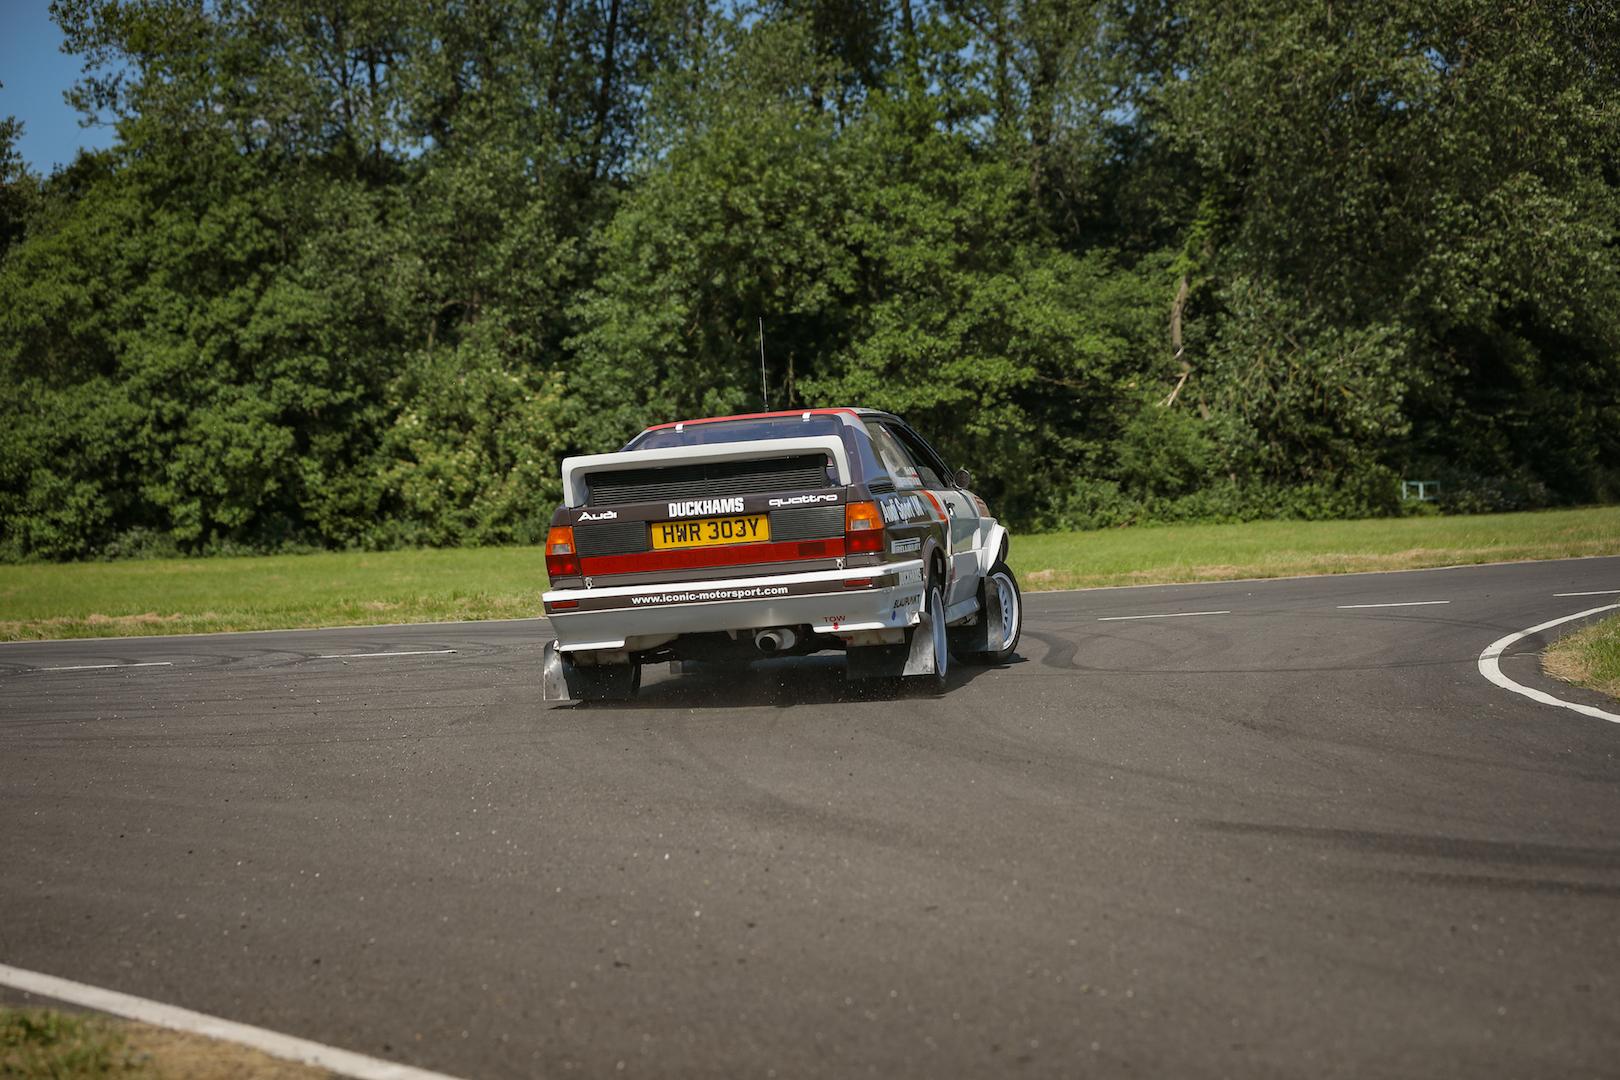 Take to the Road Feature Audi Quattro Turbo Group 4 Spec - 3 laps around Curborough Sprint Course